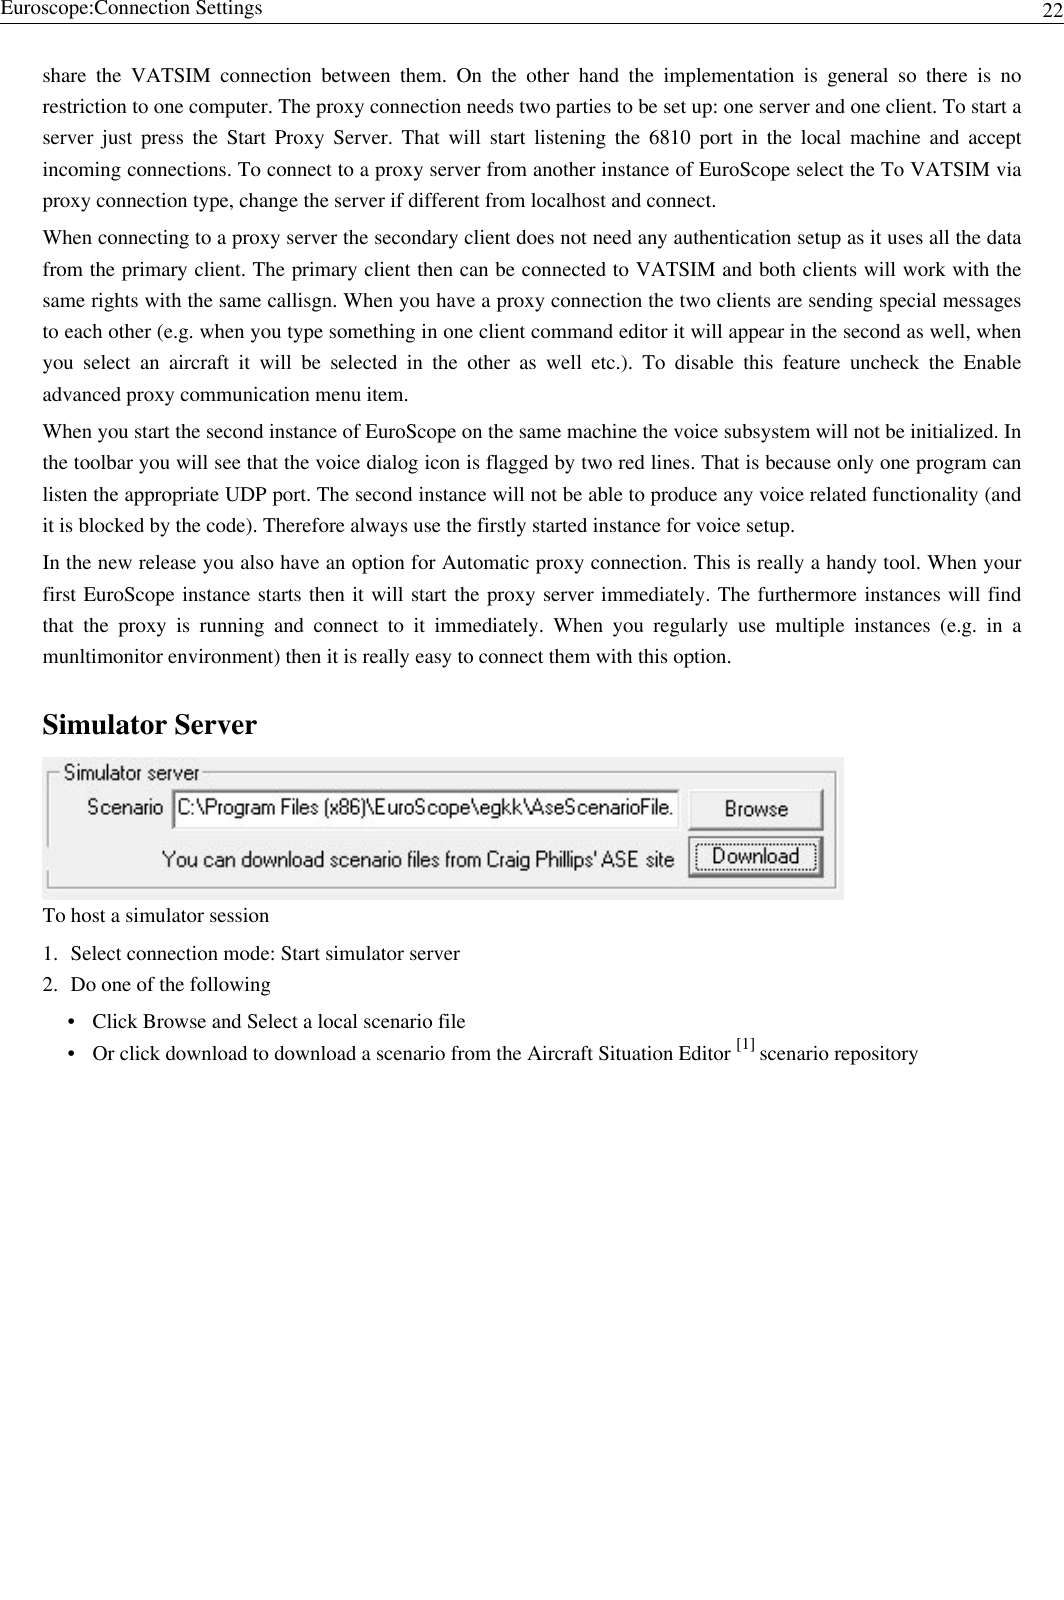 Euroscope 3 1d Manual